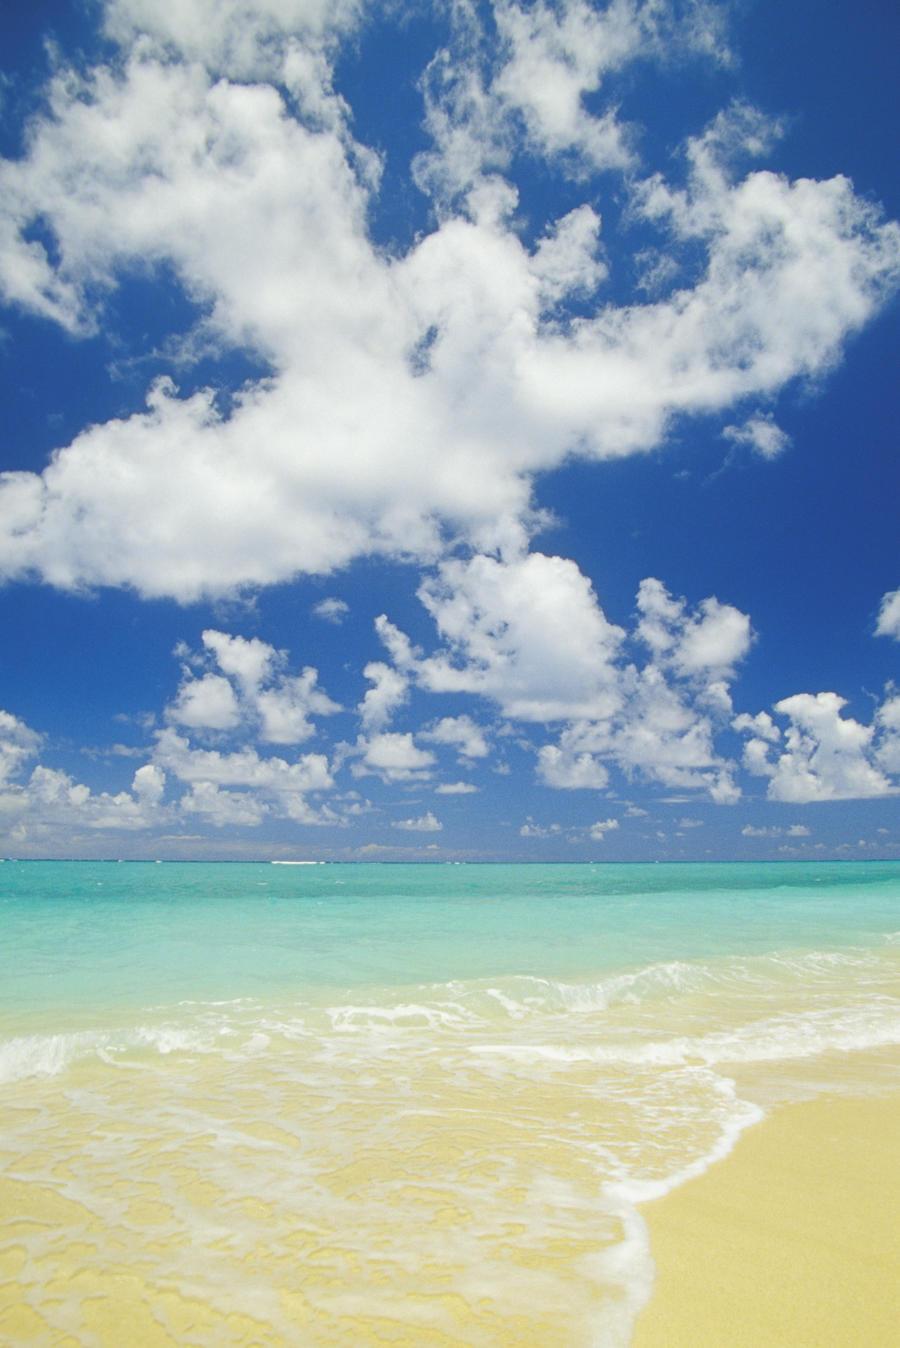 Hawaii, Oahu, Lanikai; Gentle Wave Washing Ashore On Beach, Turquoise Water And Blue Sky.  Print